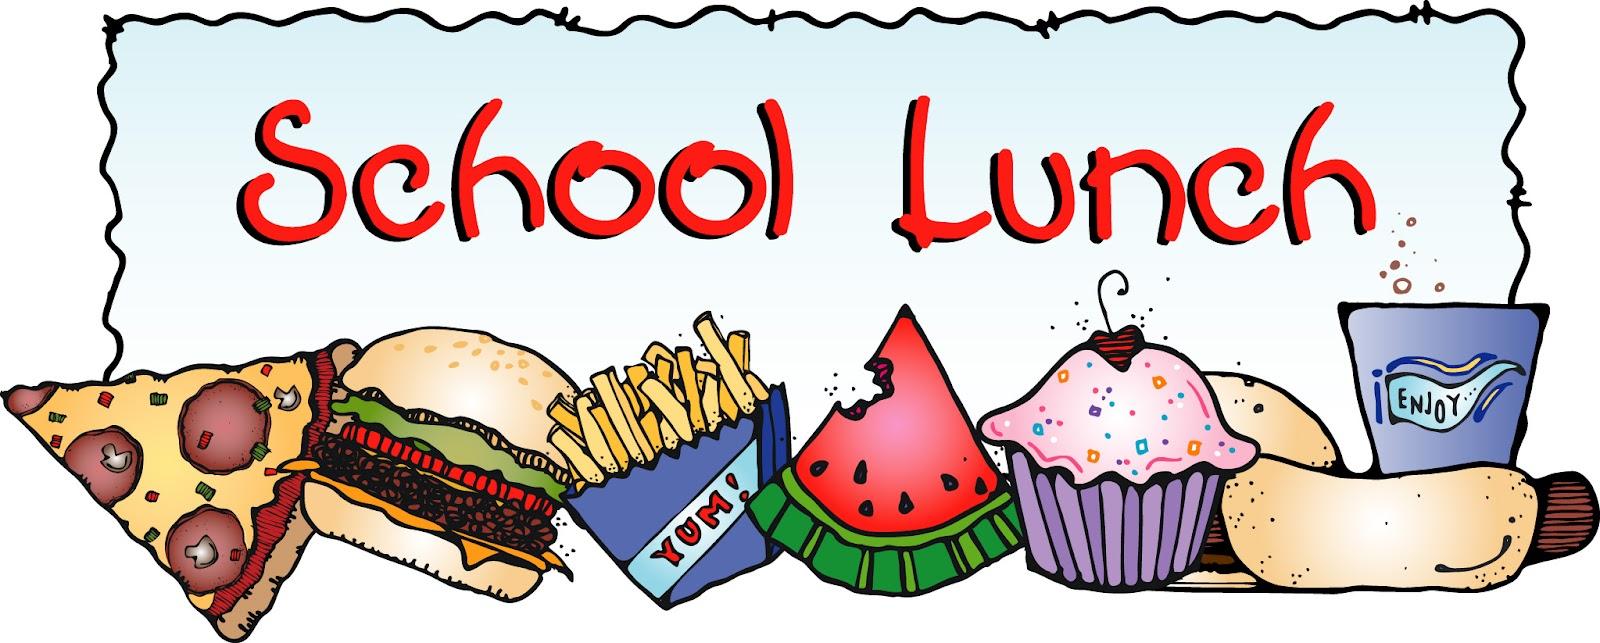 School lunch clip art free